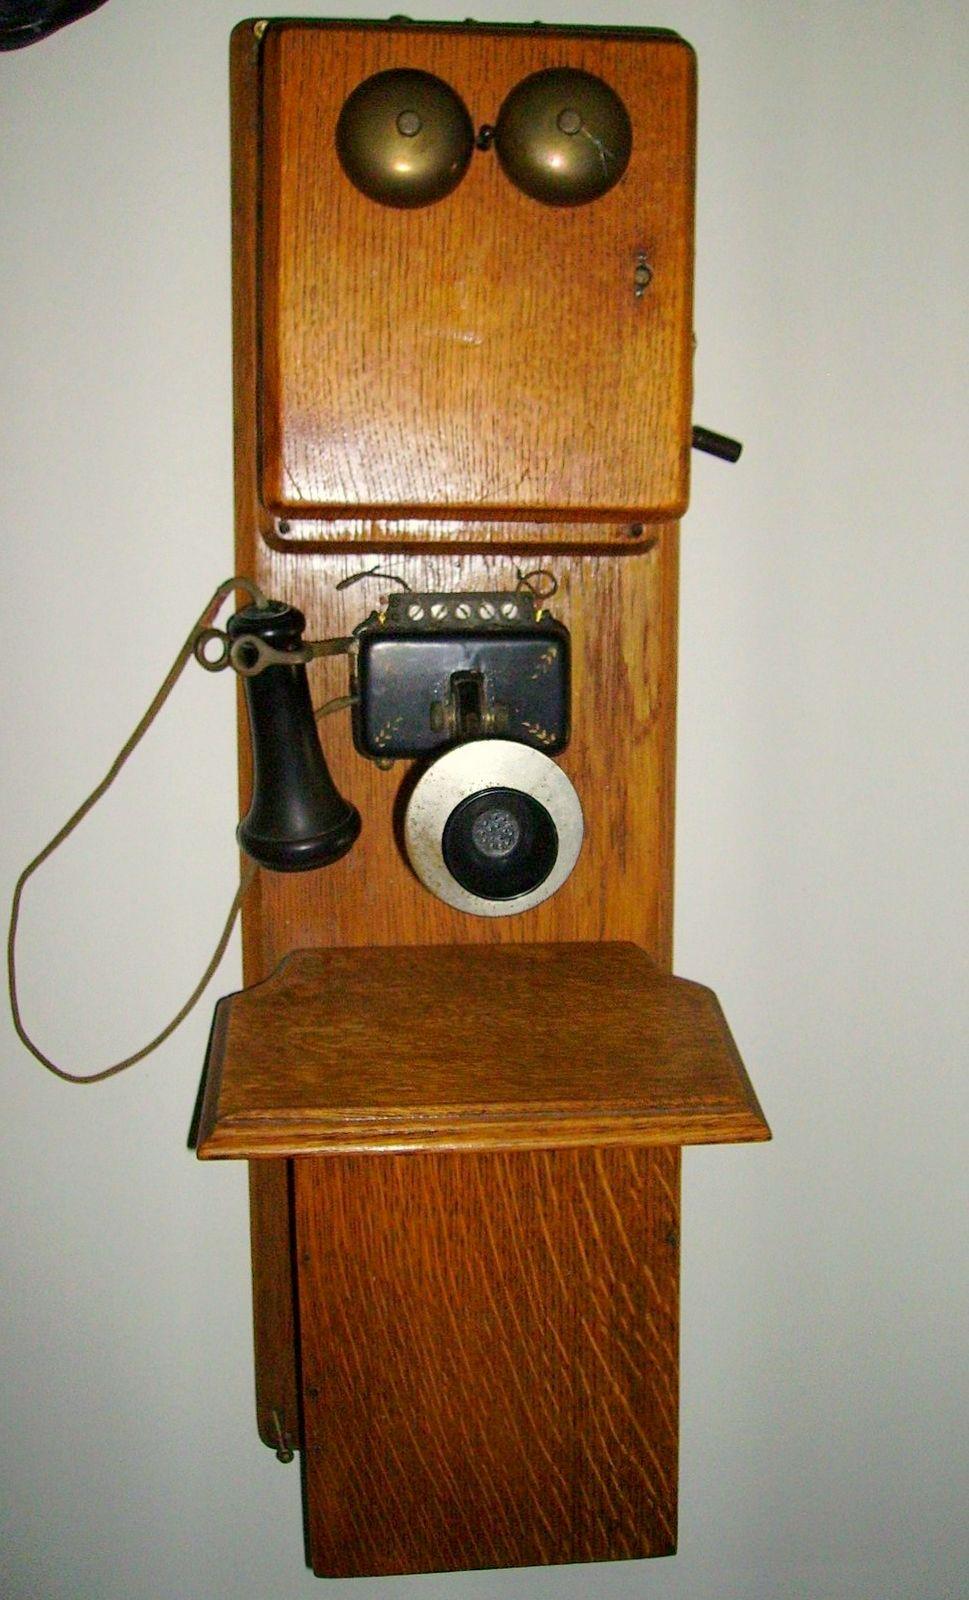 Stromberg Carlson Telephone Wiring Diagram Explained Diagrams Crank Western Illinois Museum Phone